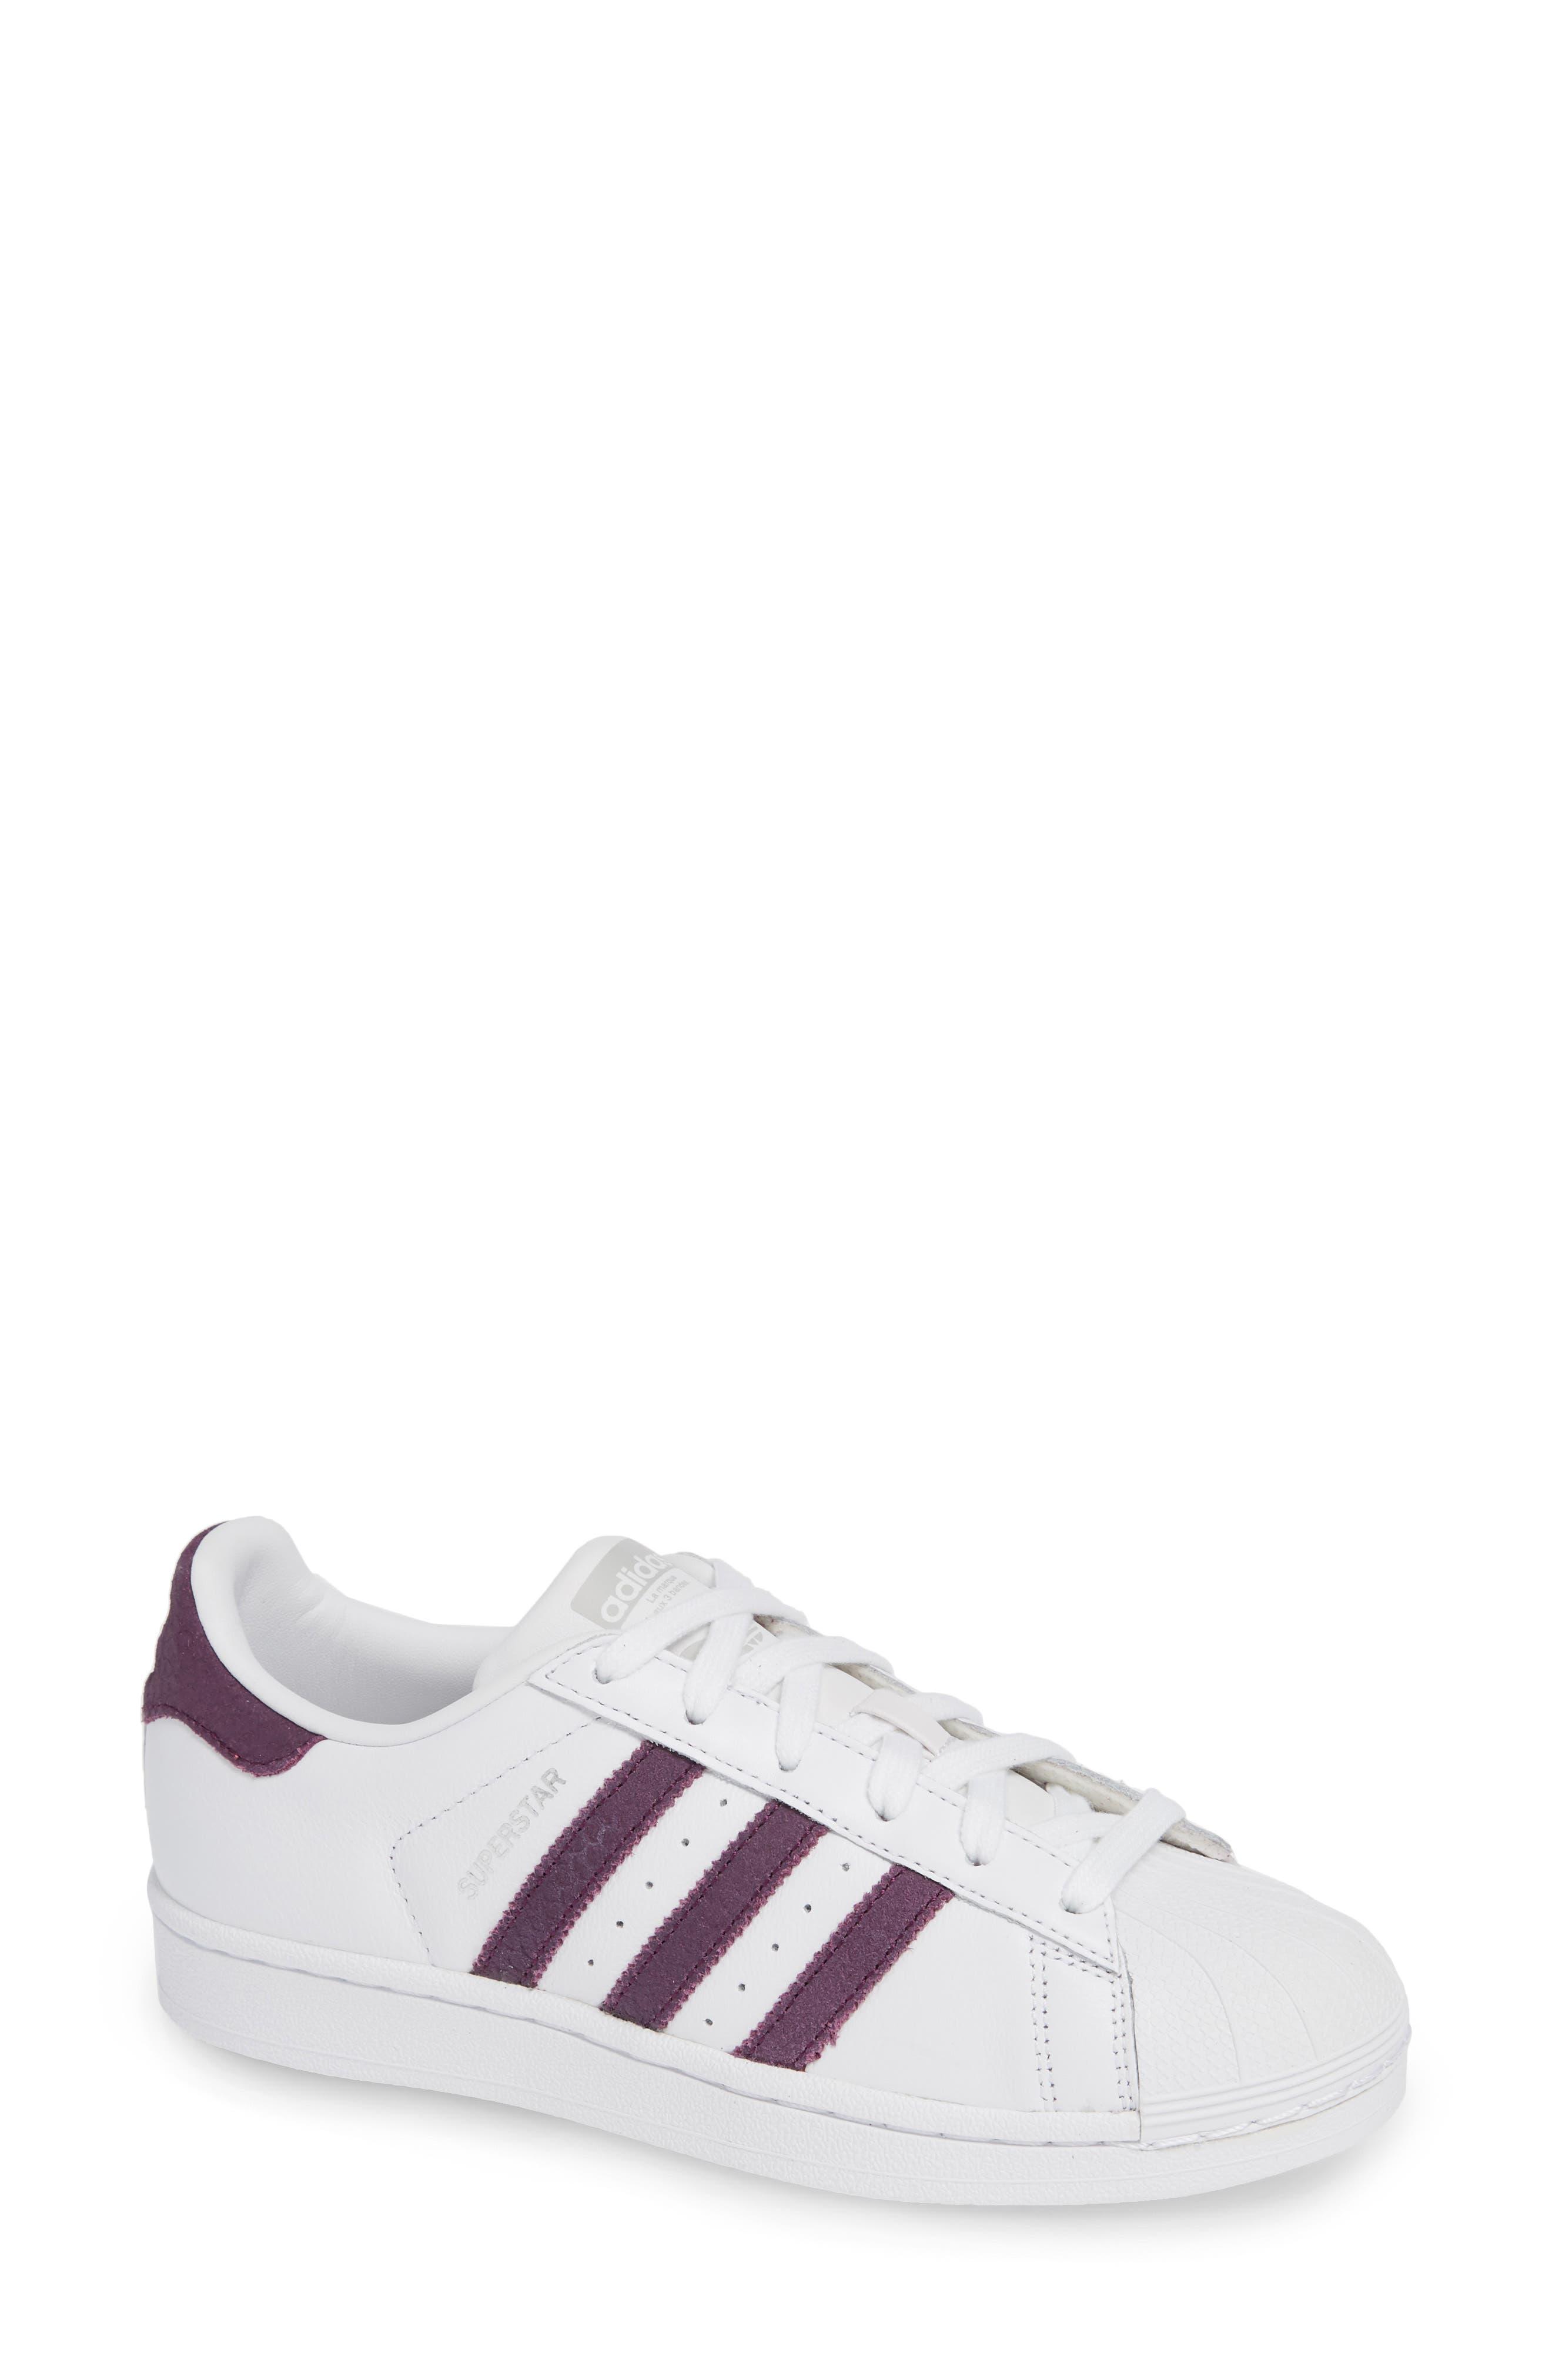 discount grey purple womens adidas neo shoes 82895 062b1